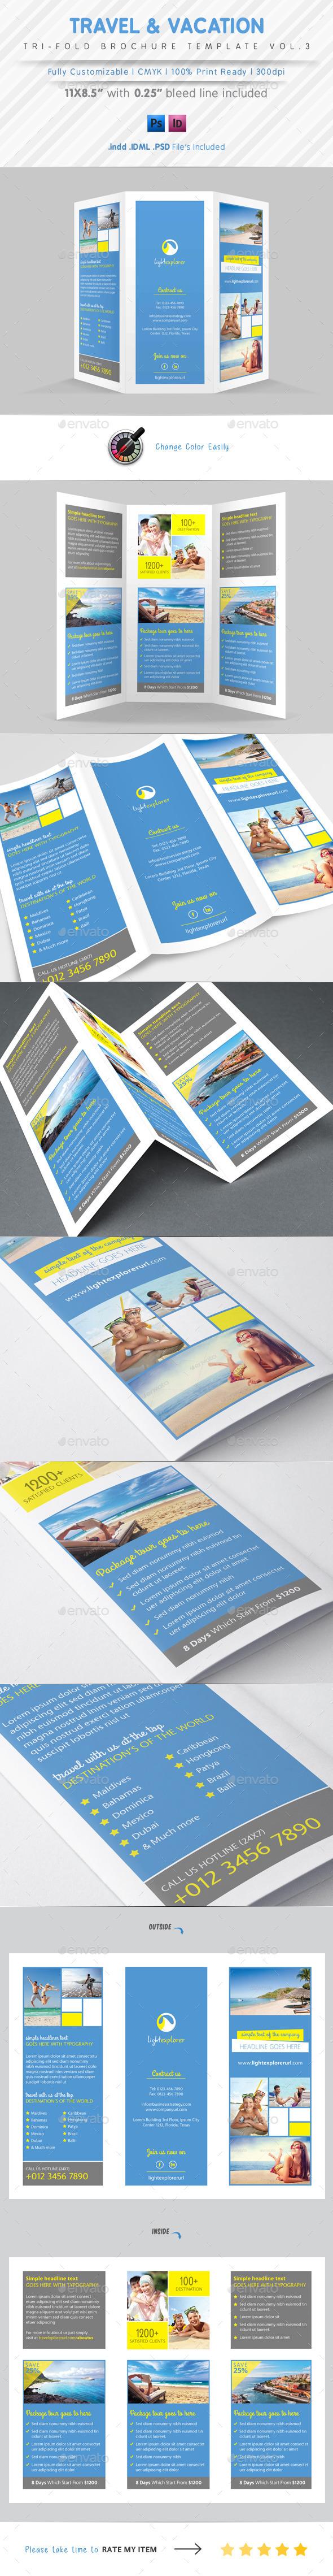 Travel Agency Tri Fold Brochure Vol.3 - Corporate Brochures